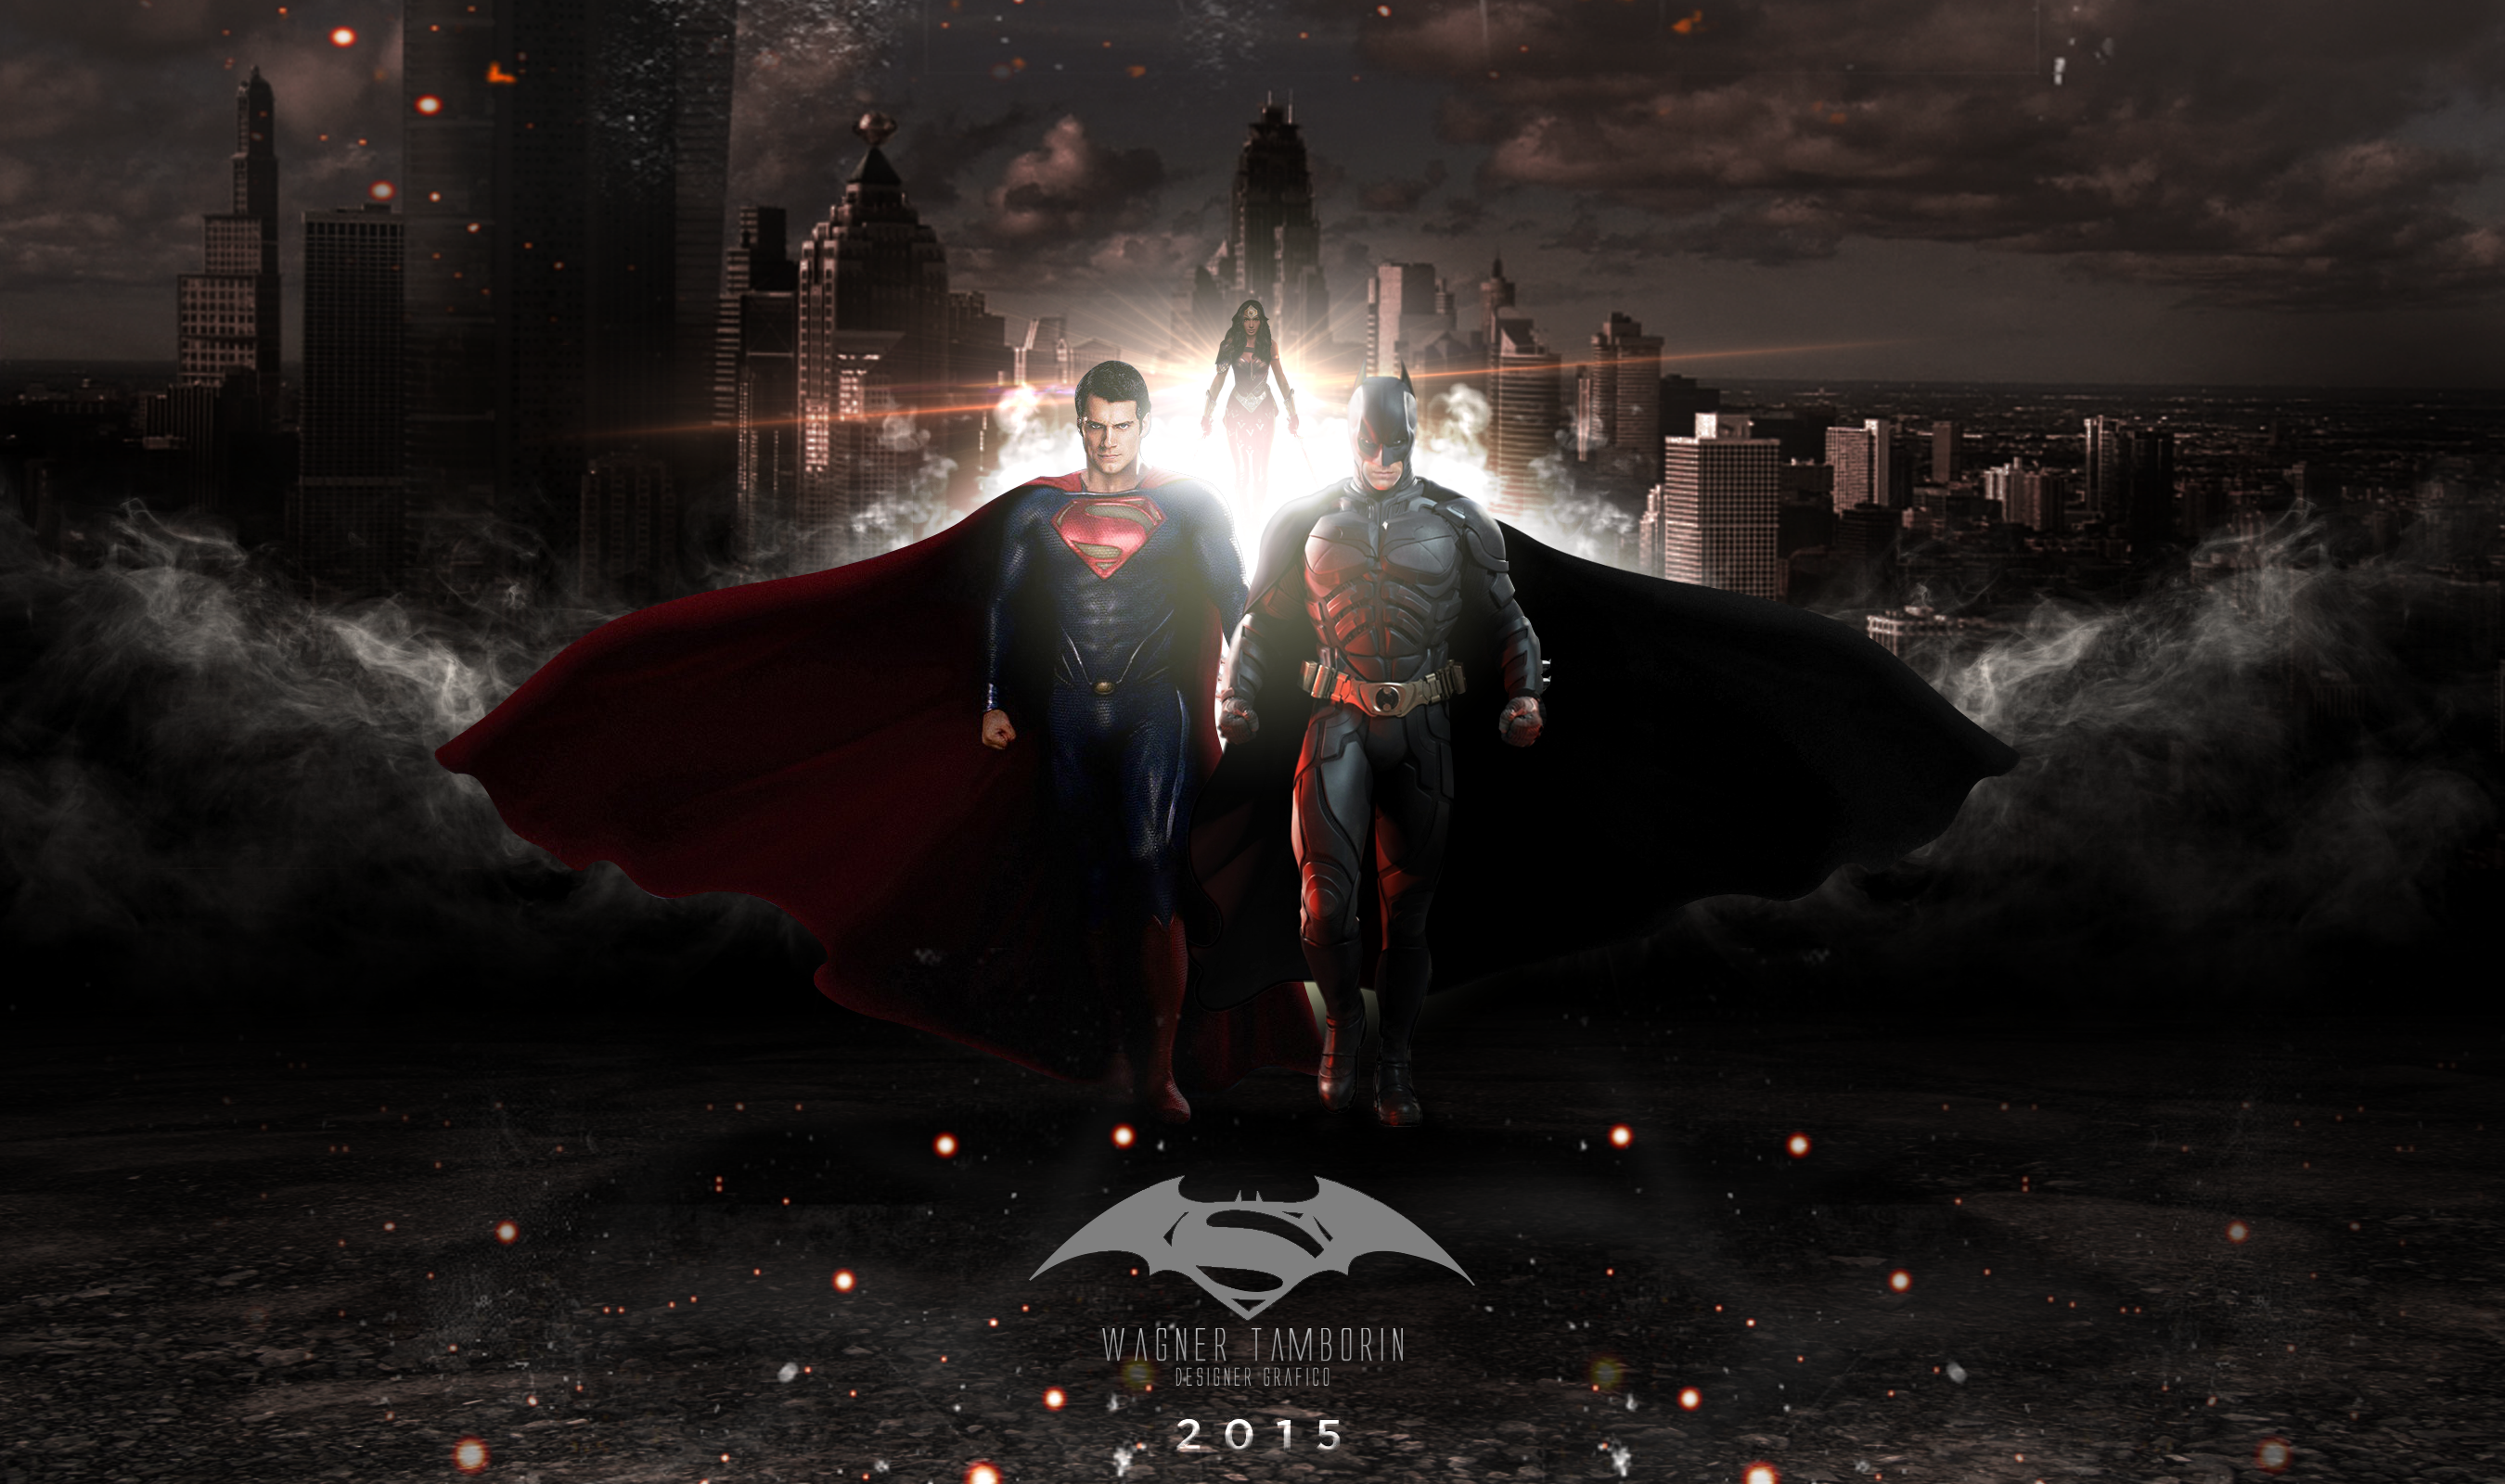 batman vs superman wallpaper by wagnertamborin fan art wallpaper 2700x1600